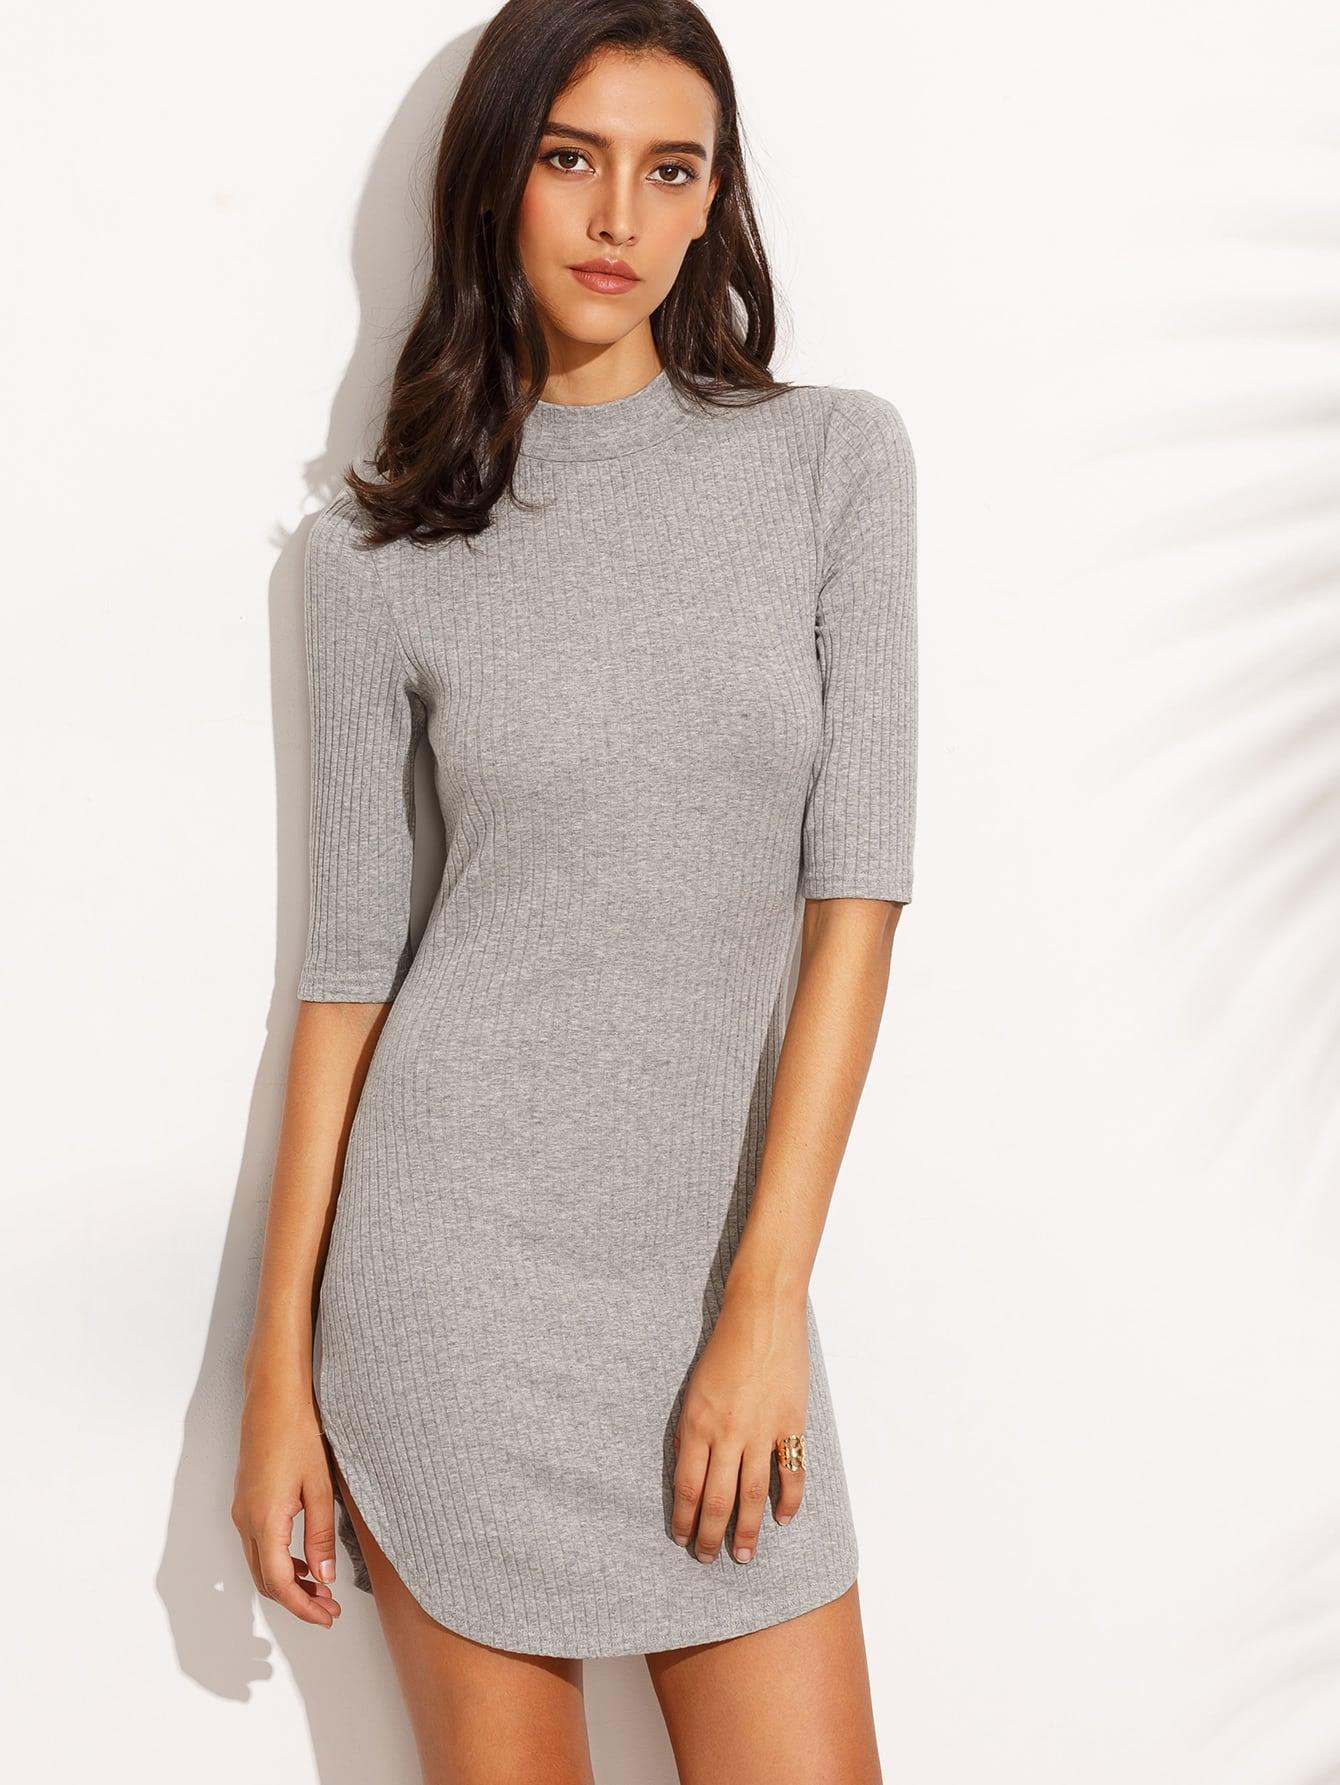 Dolphin Hem Elbow Sleeve Ribbed Dress dress160805720